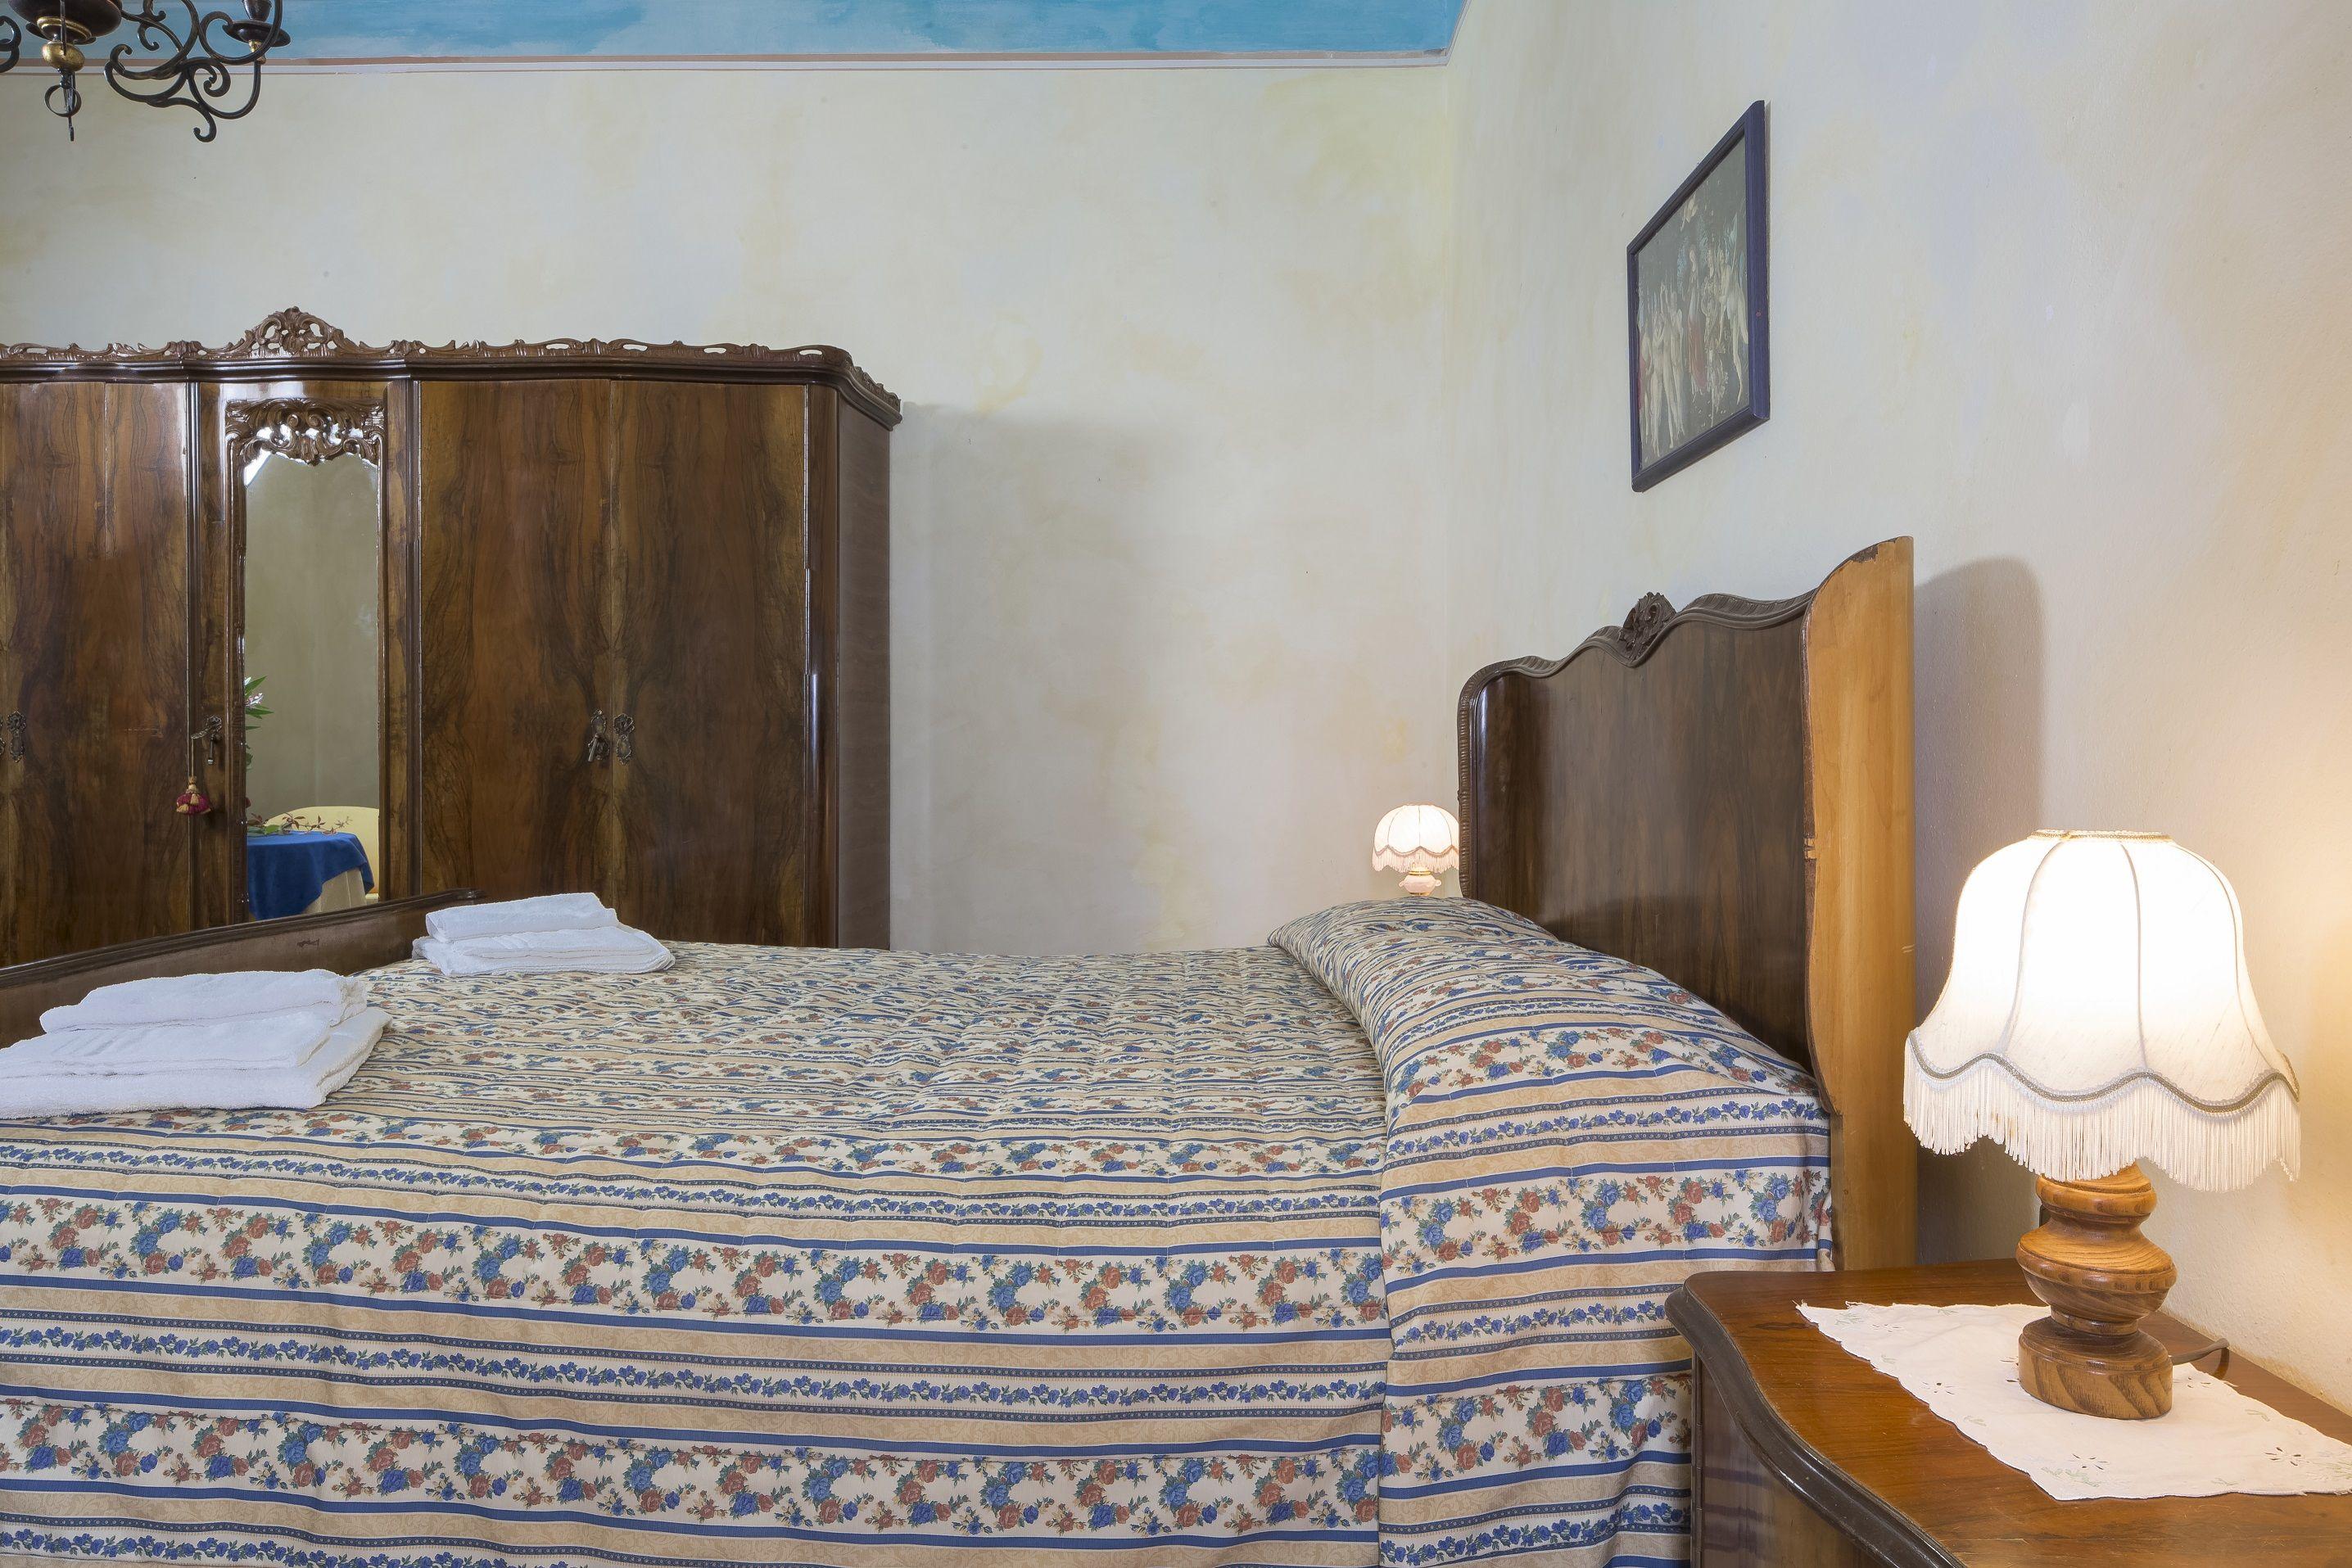 Apartment Bosco Lazzeroni Residence - Aida Holiday Home photo 18704210